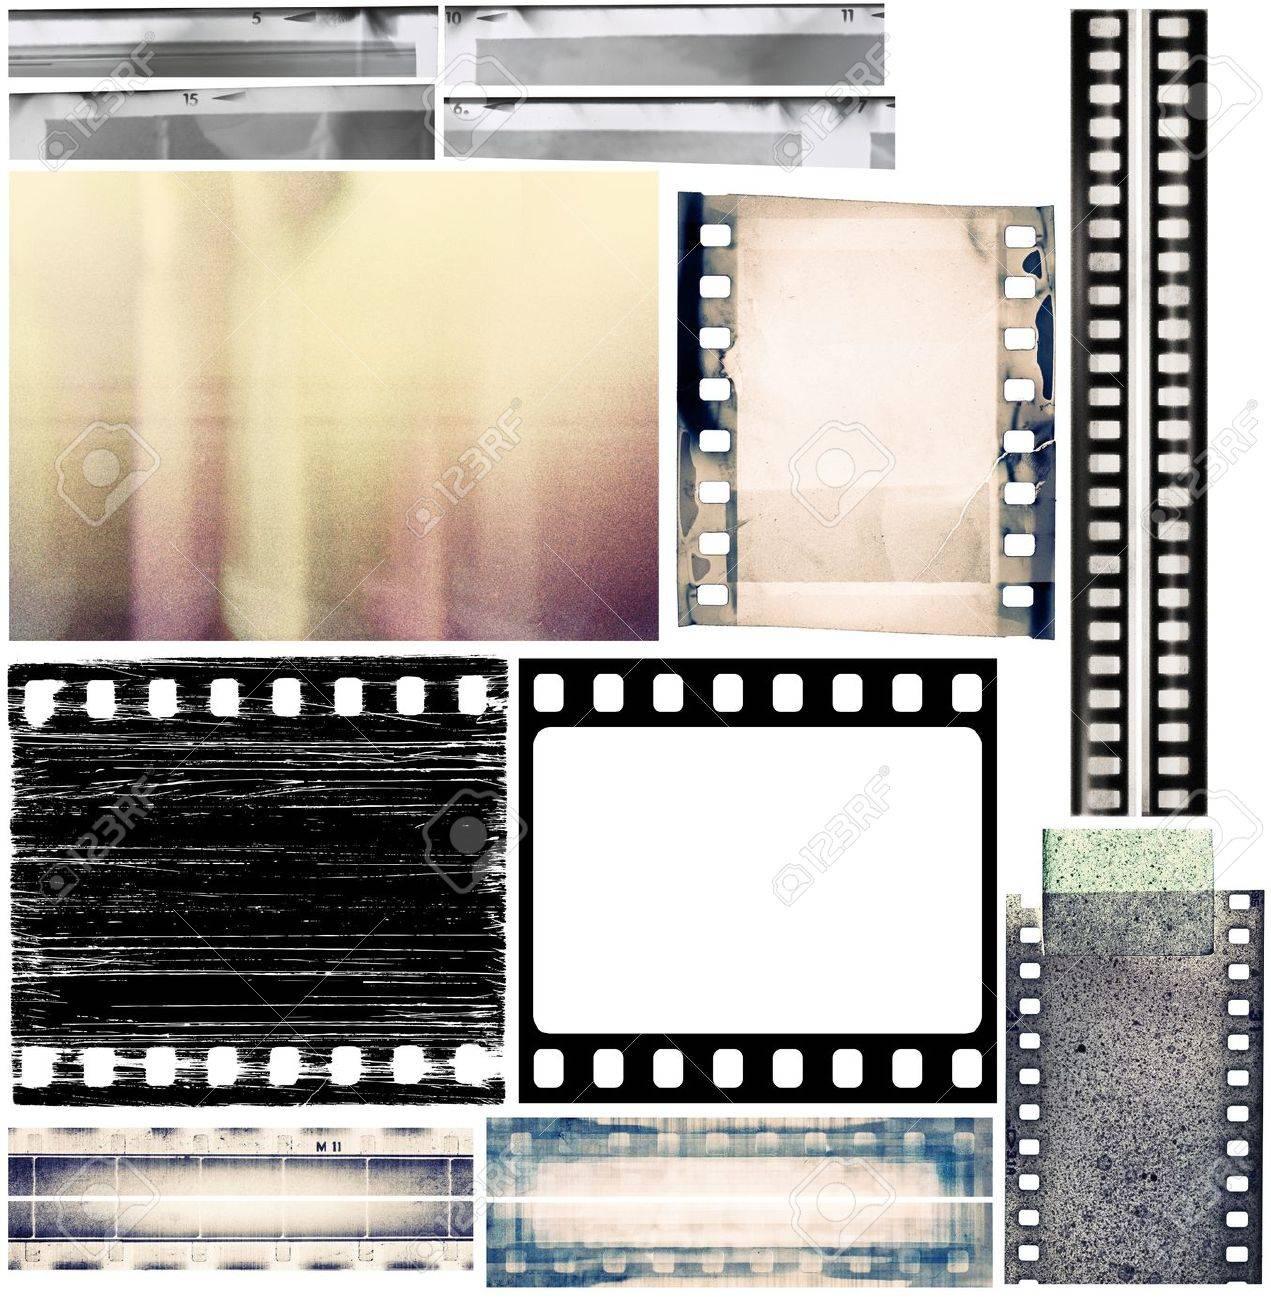 Design elements set, film borders, textures. Stock Photo - 9904428